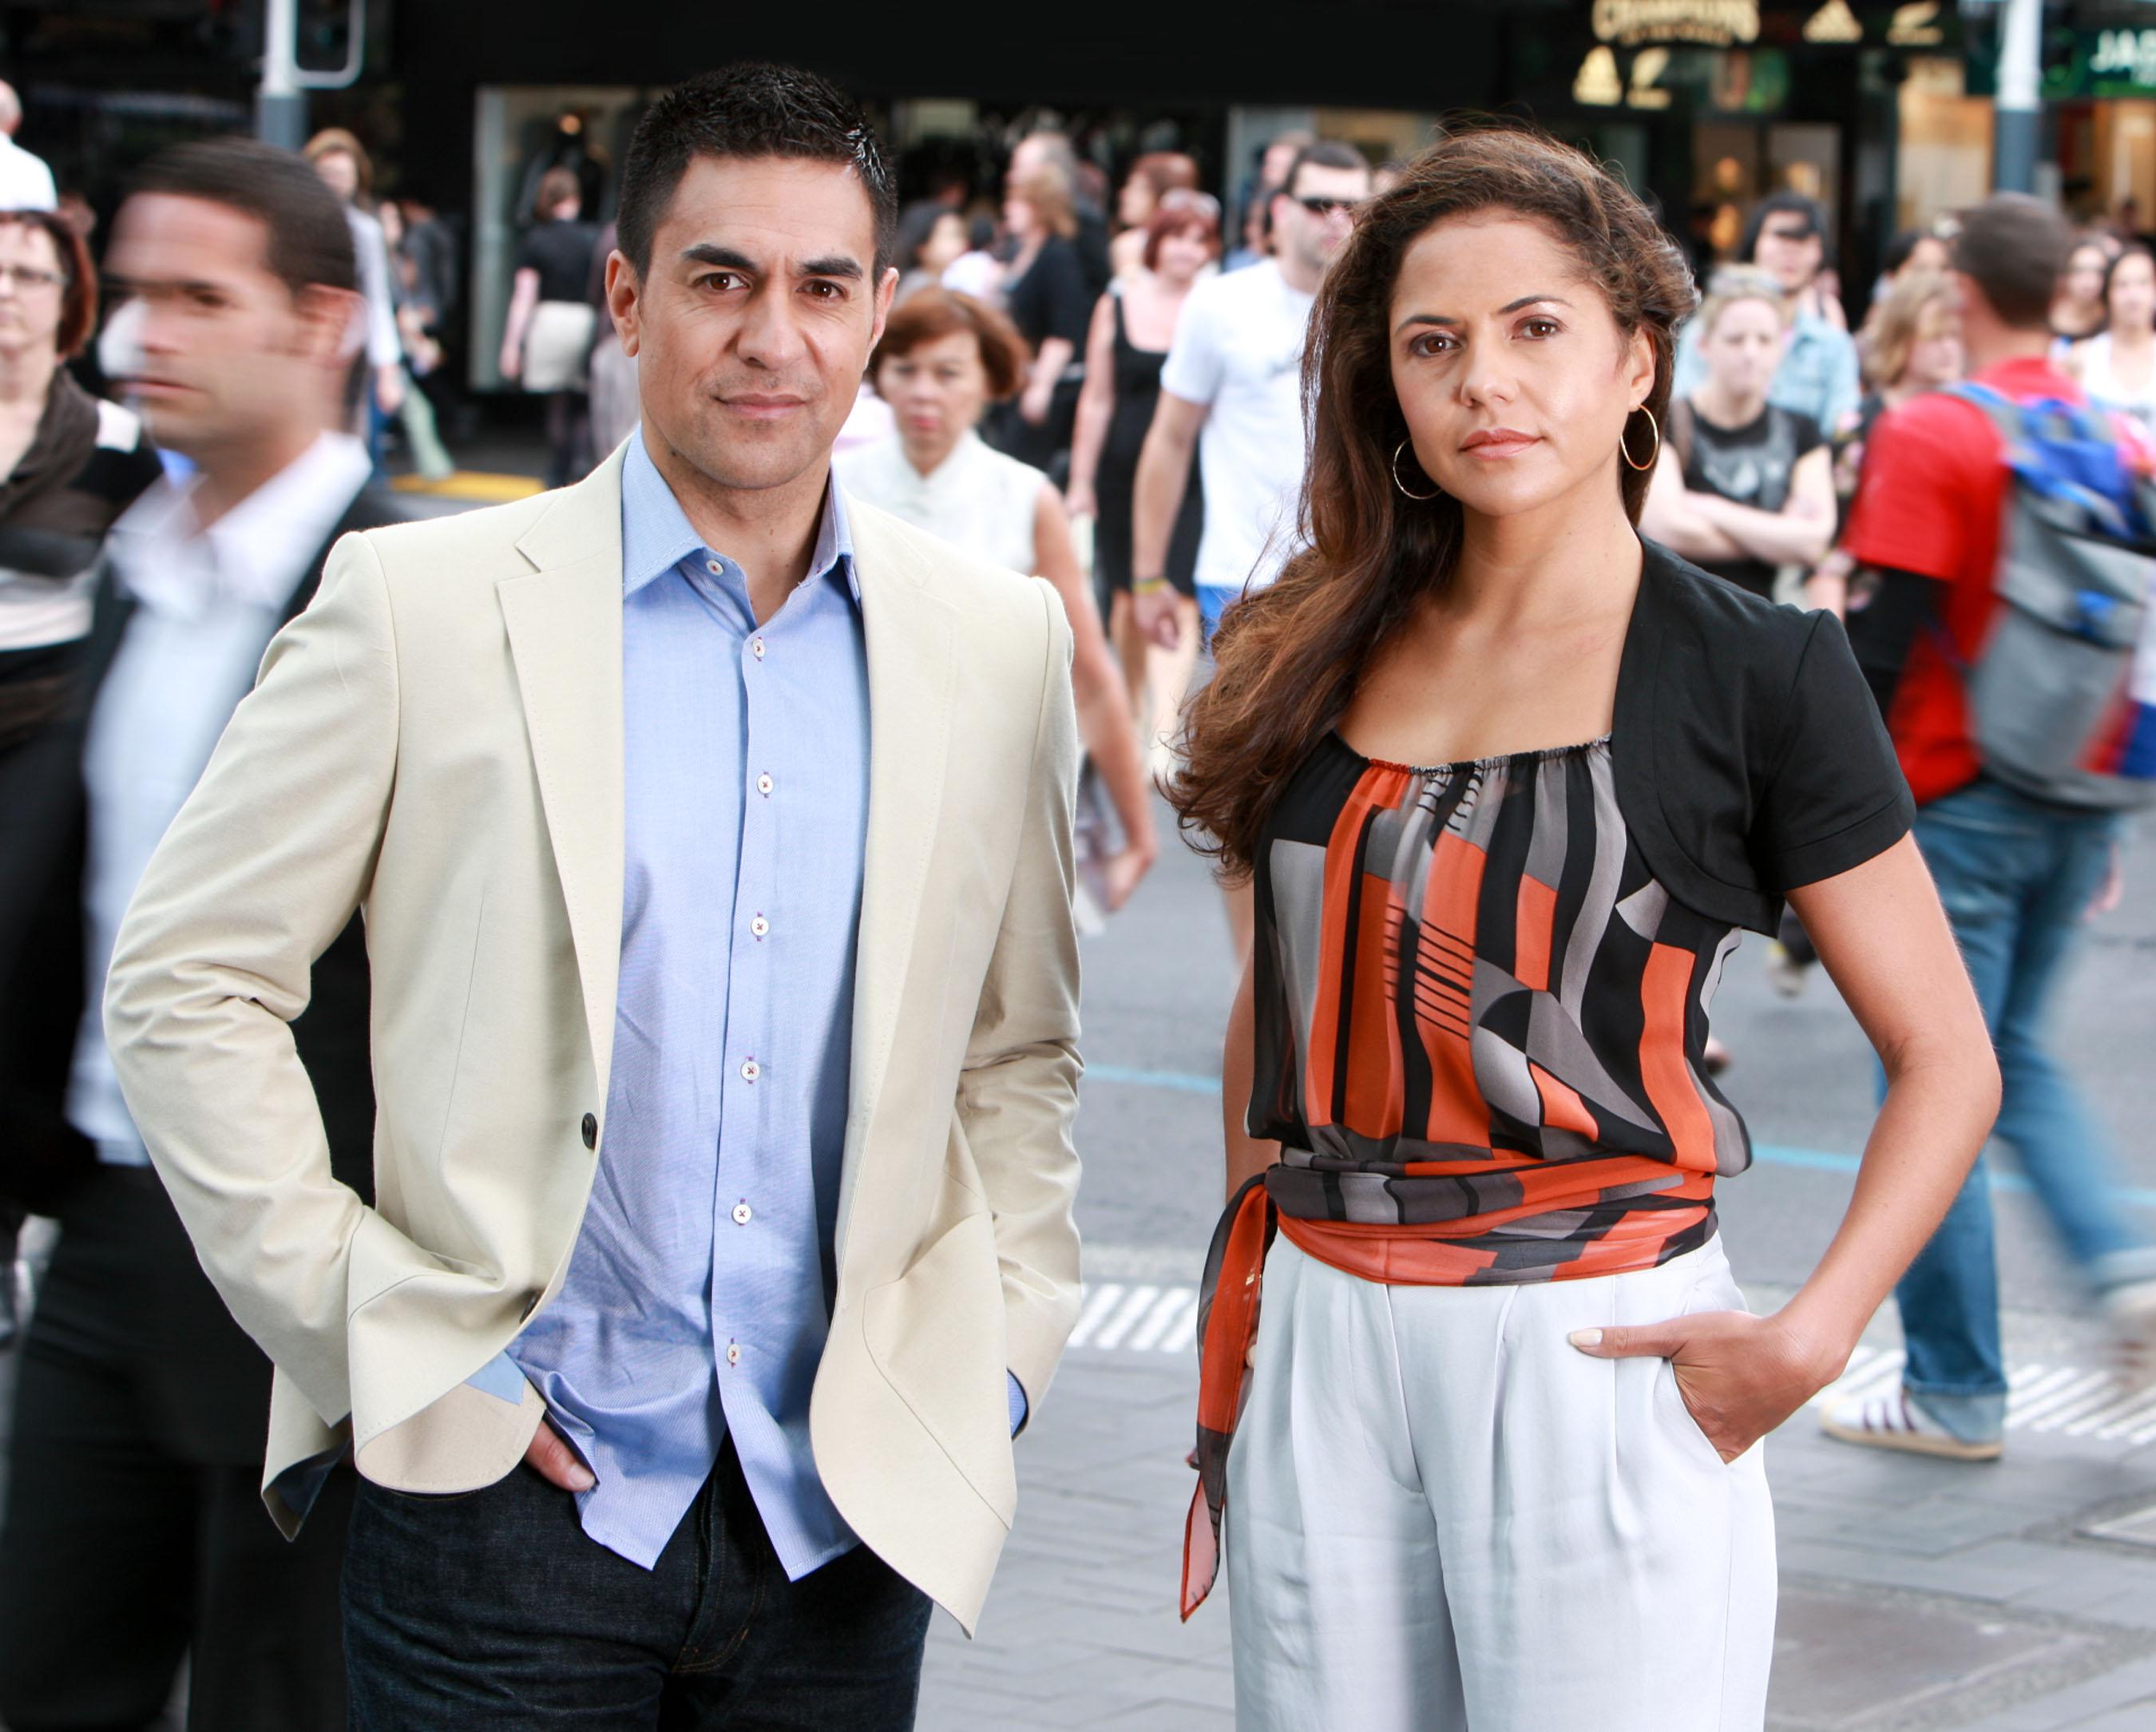 Julian & Miriama